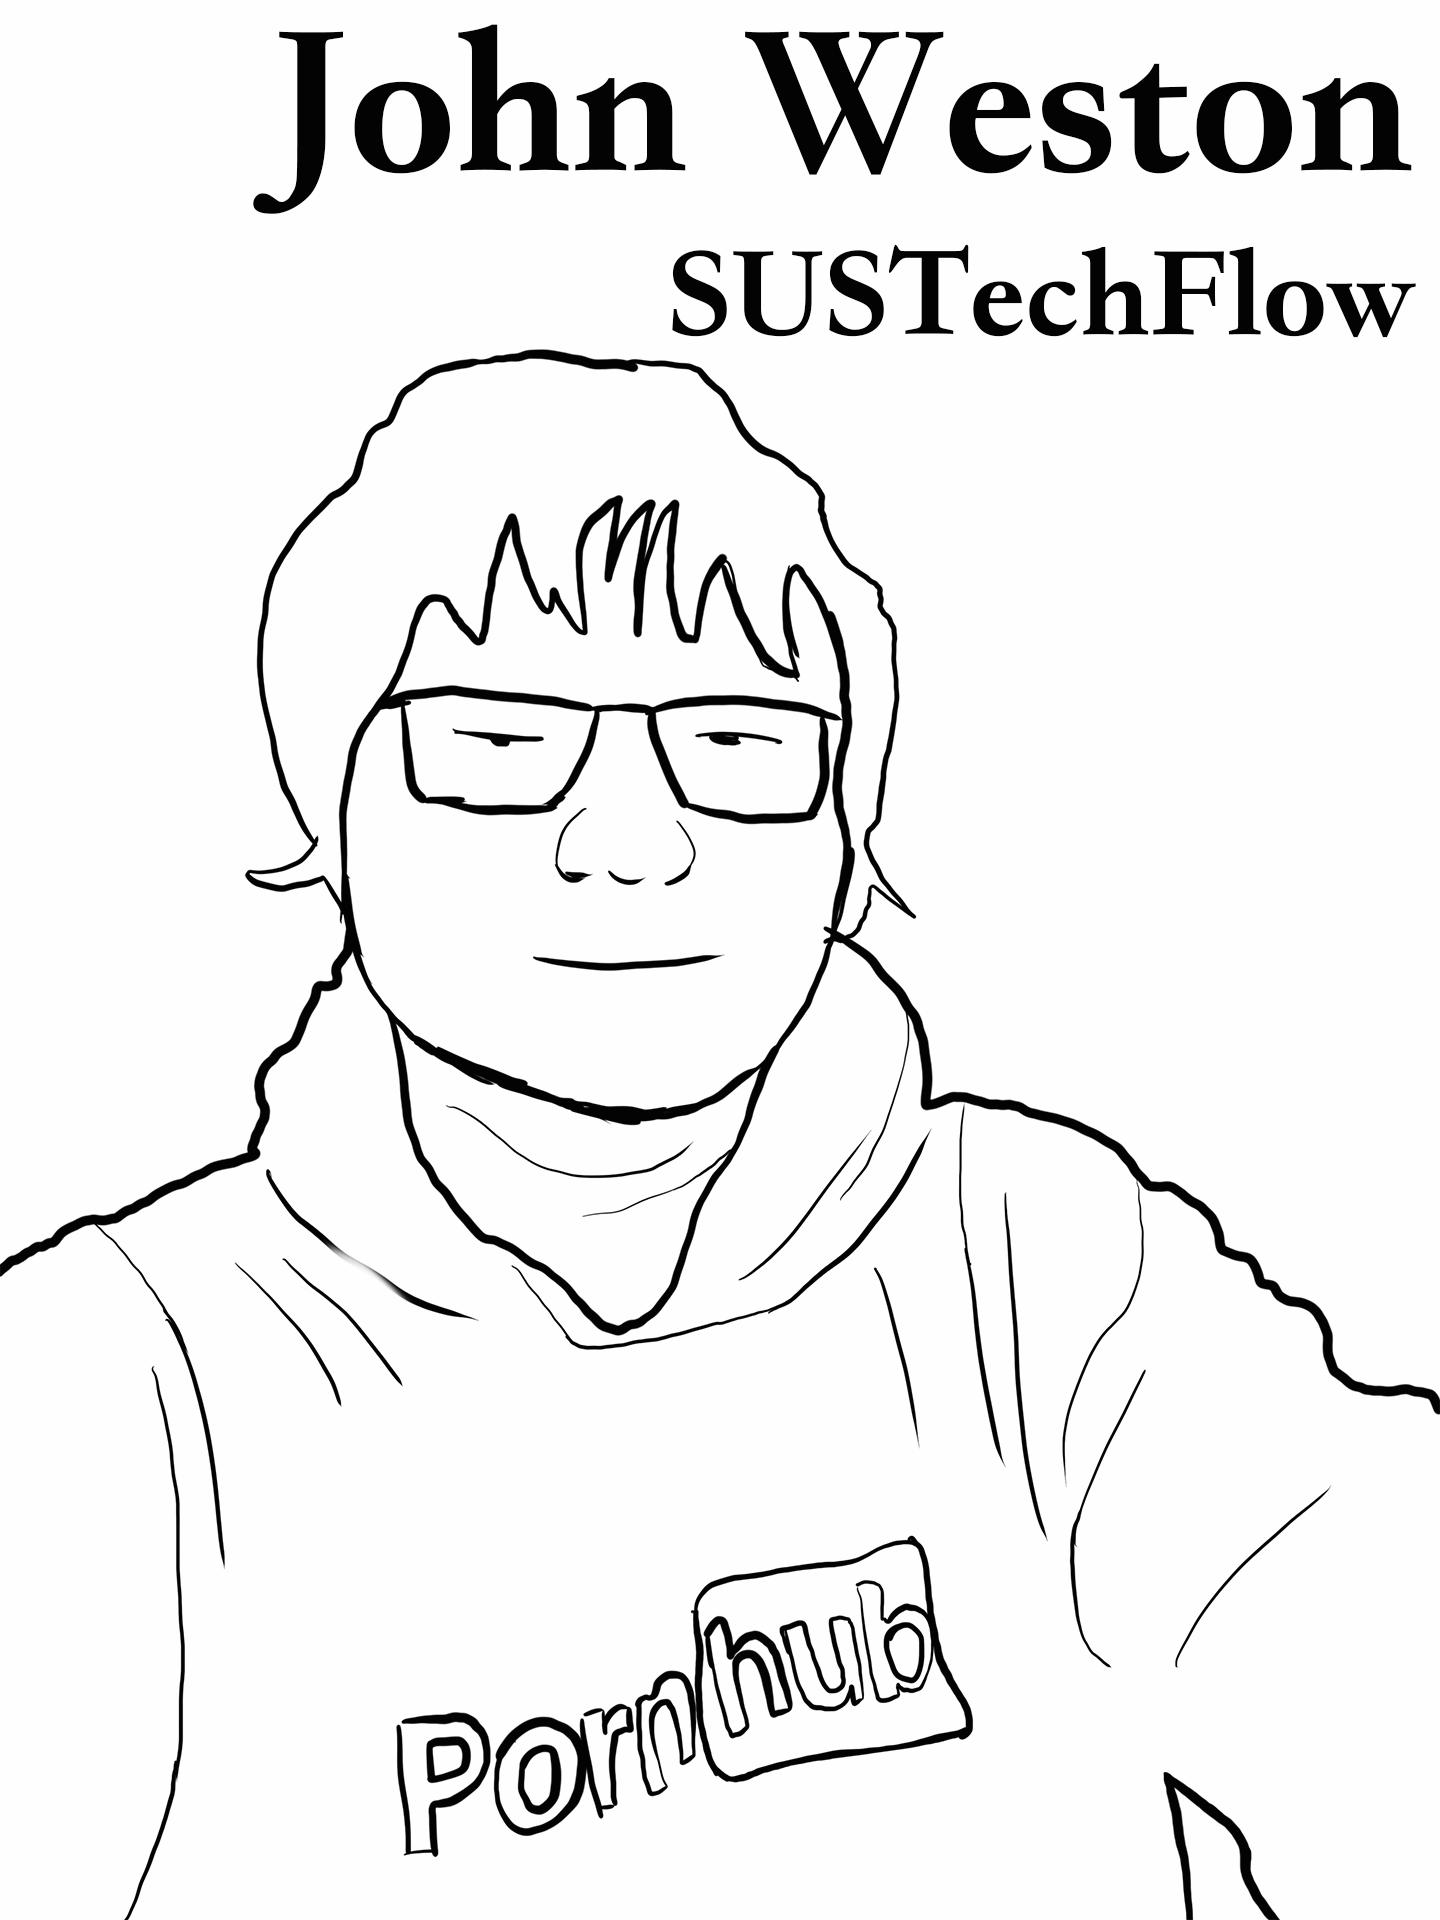 SUSTechFlow创始人JohnWeston